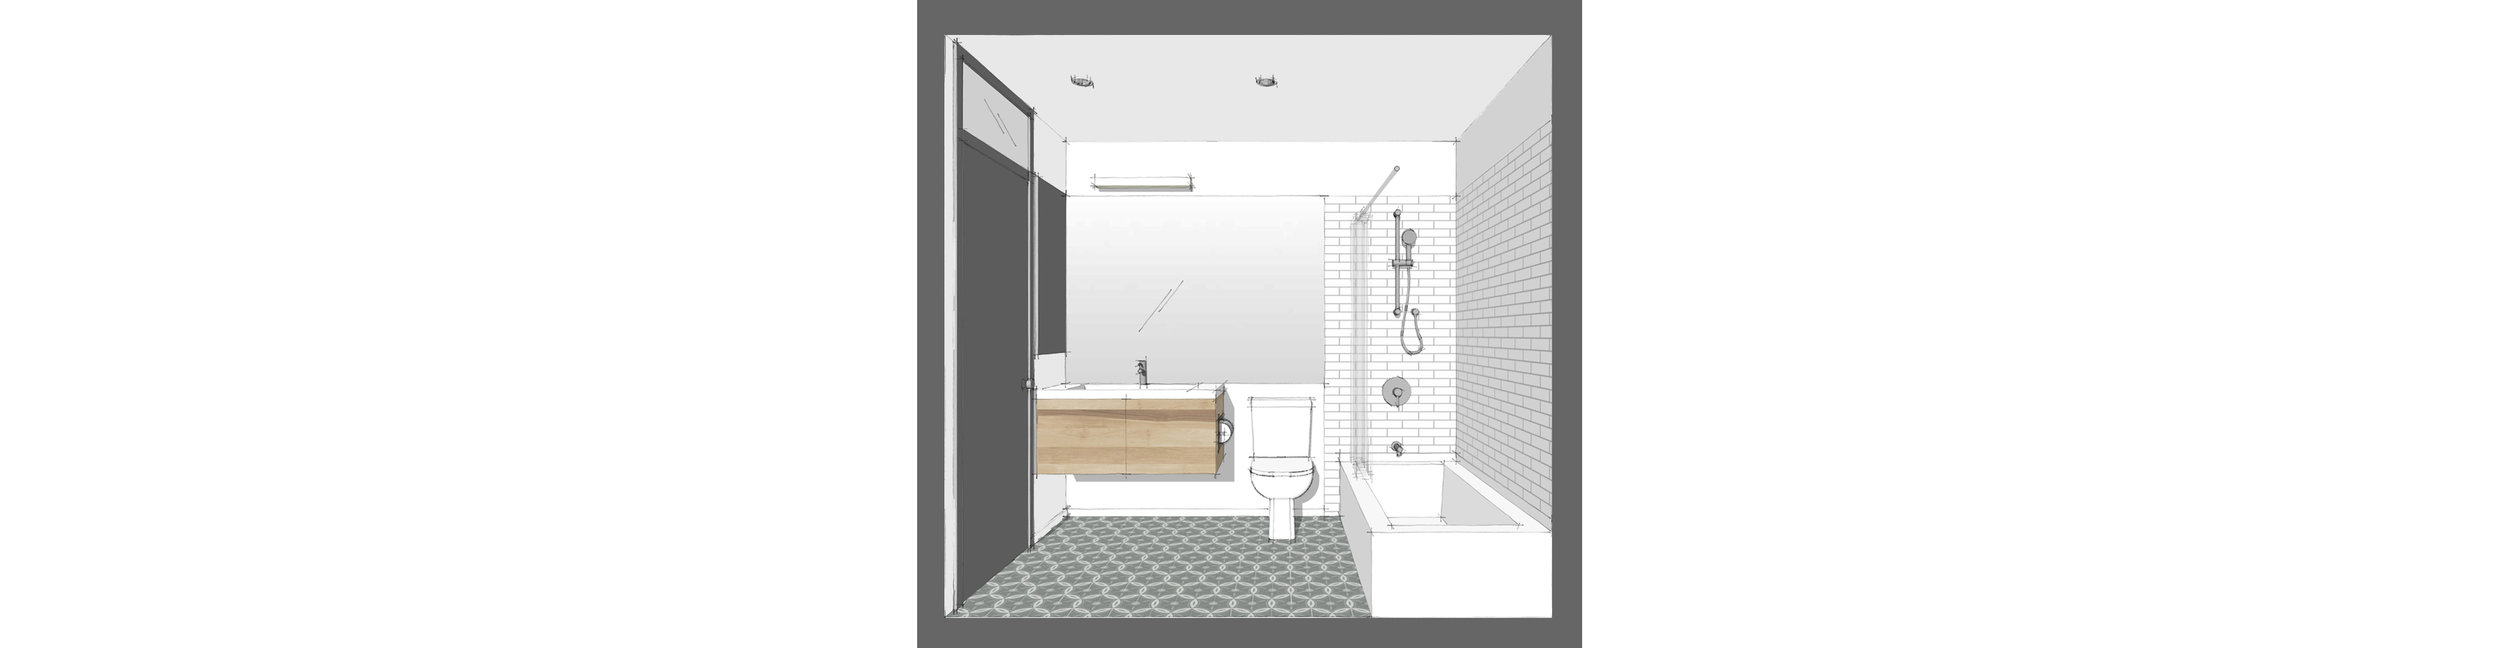 elevation - bathroom